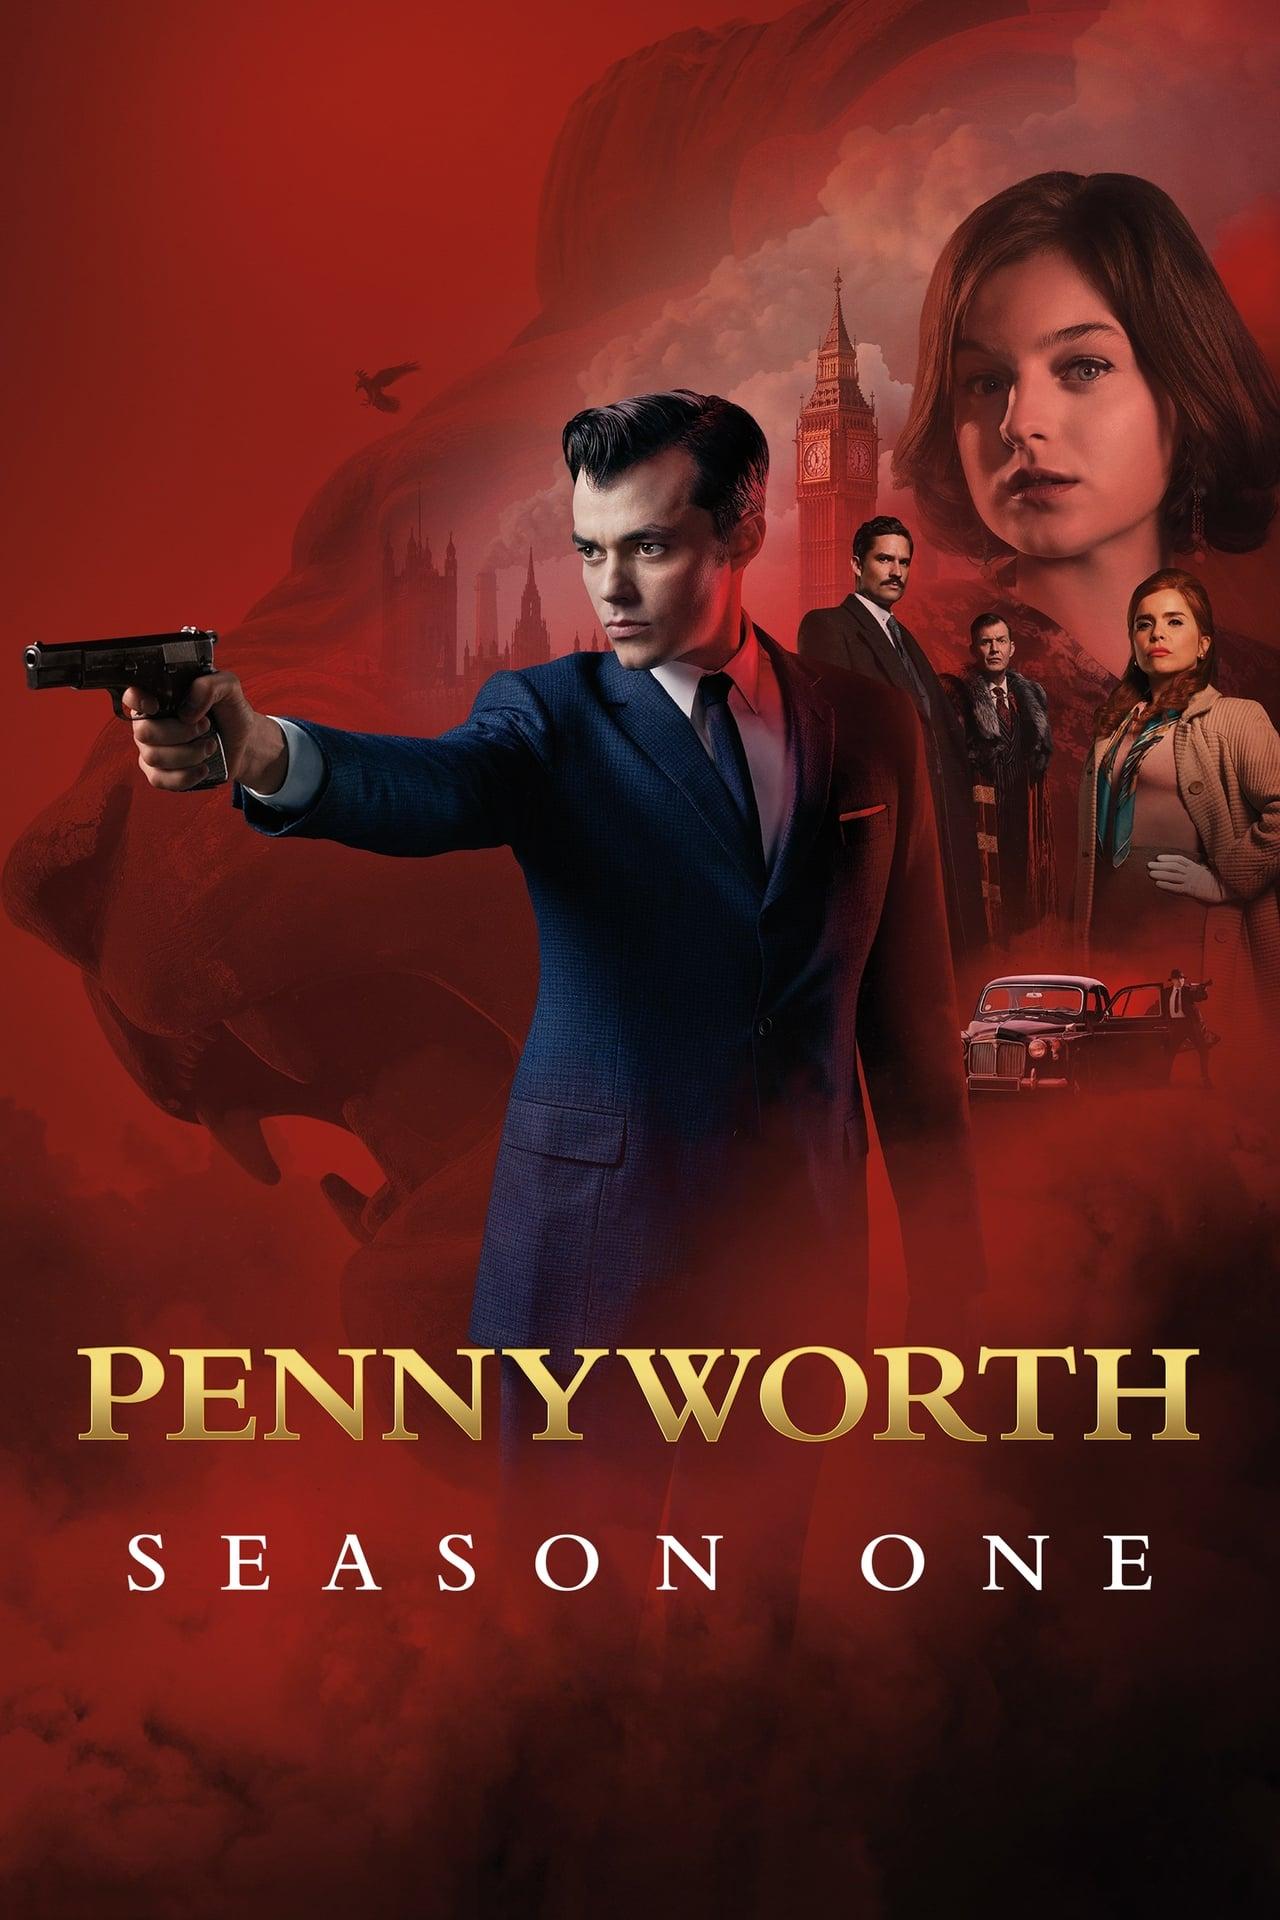 Pennyworth Season 1